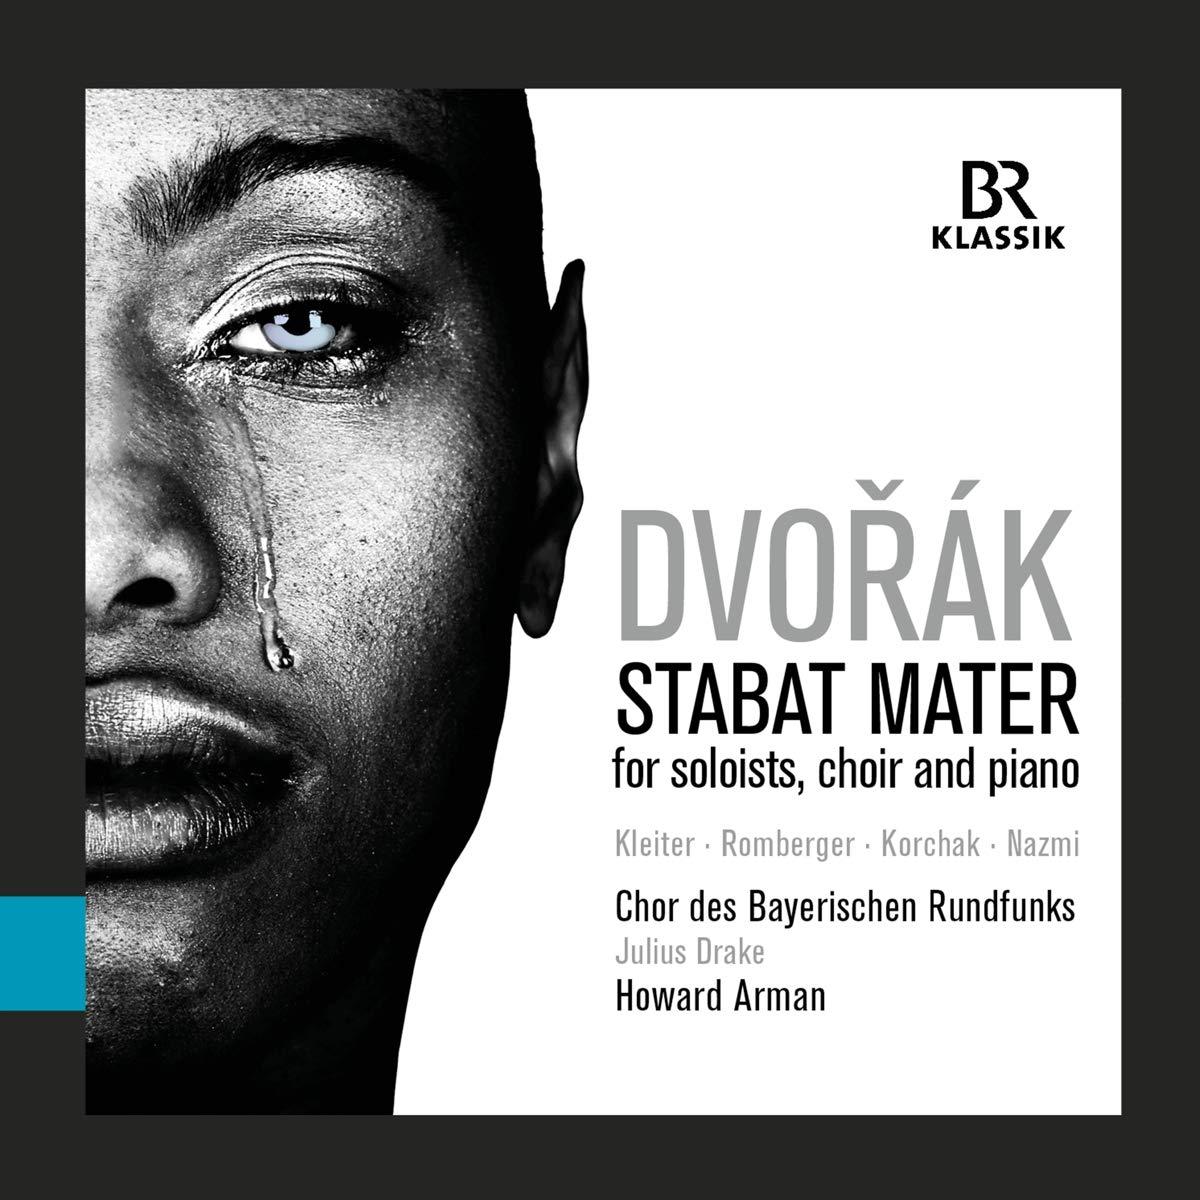 Antonín Dvořák, Stabat Mater, Op. 58, B. 71